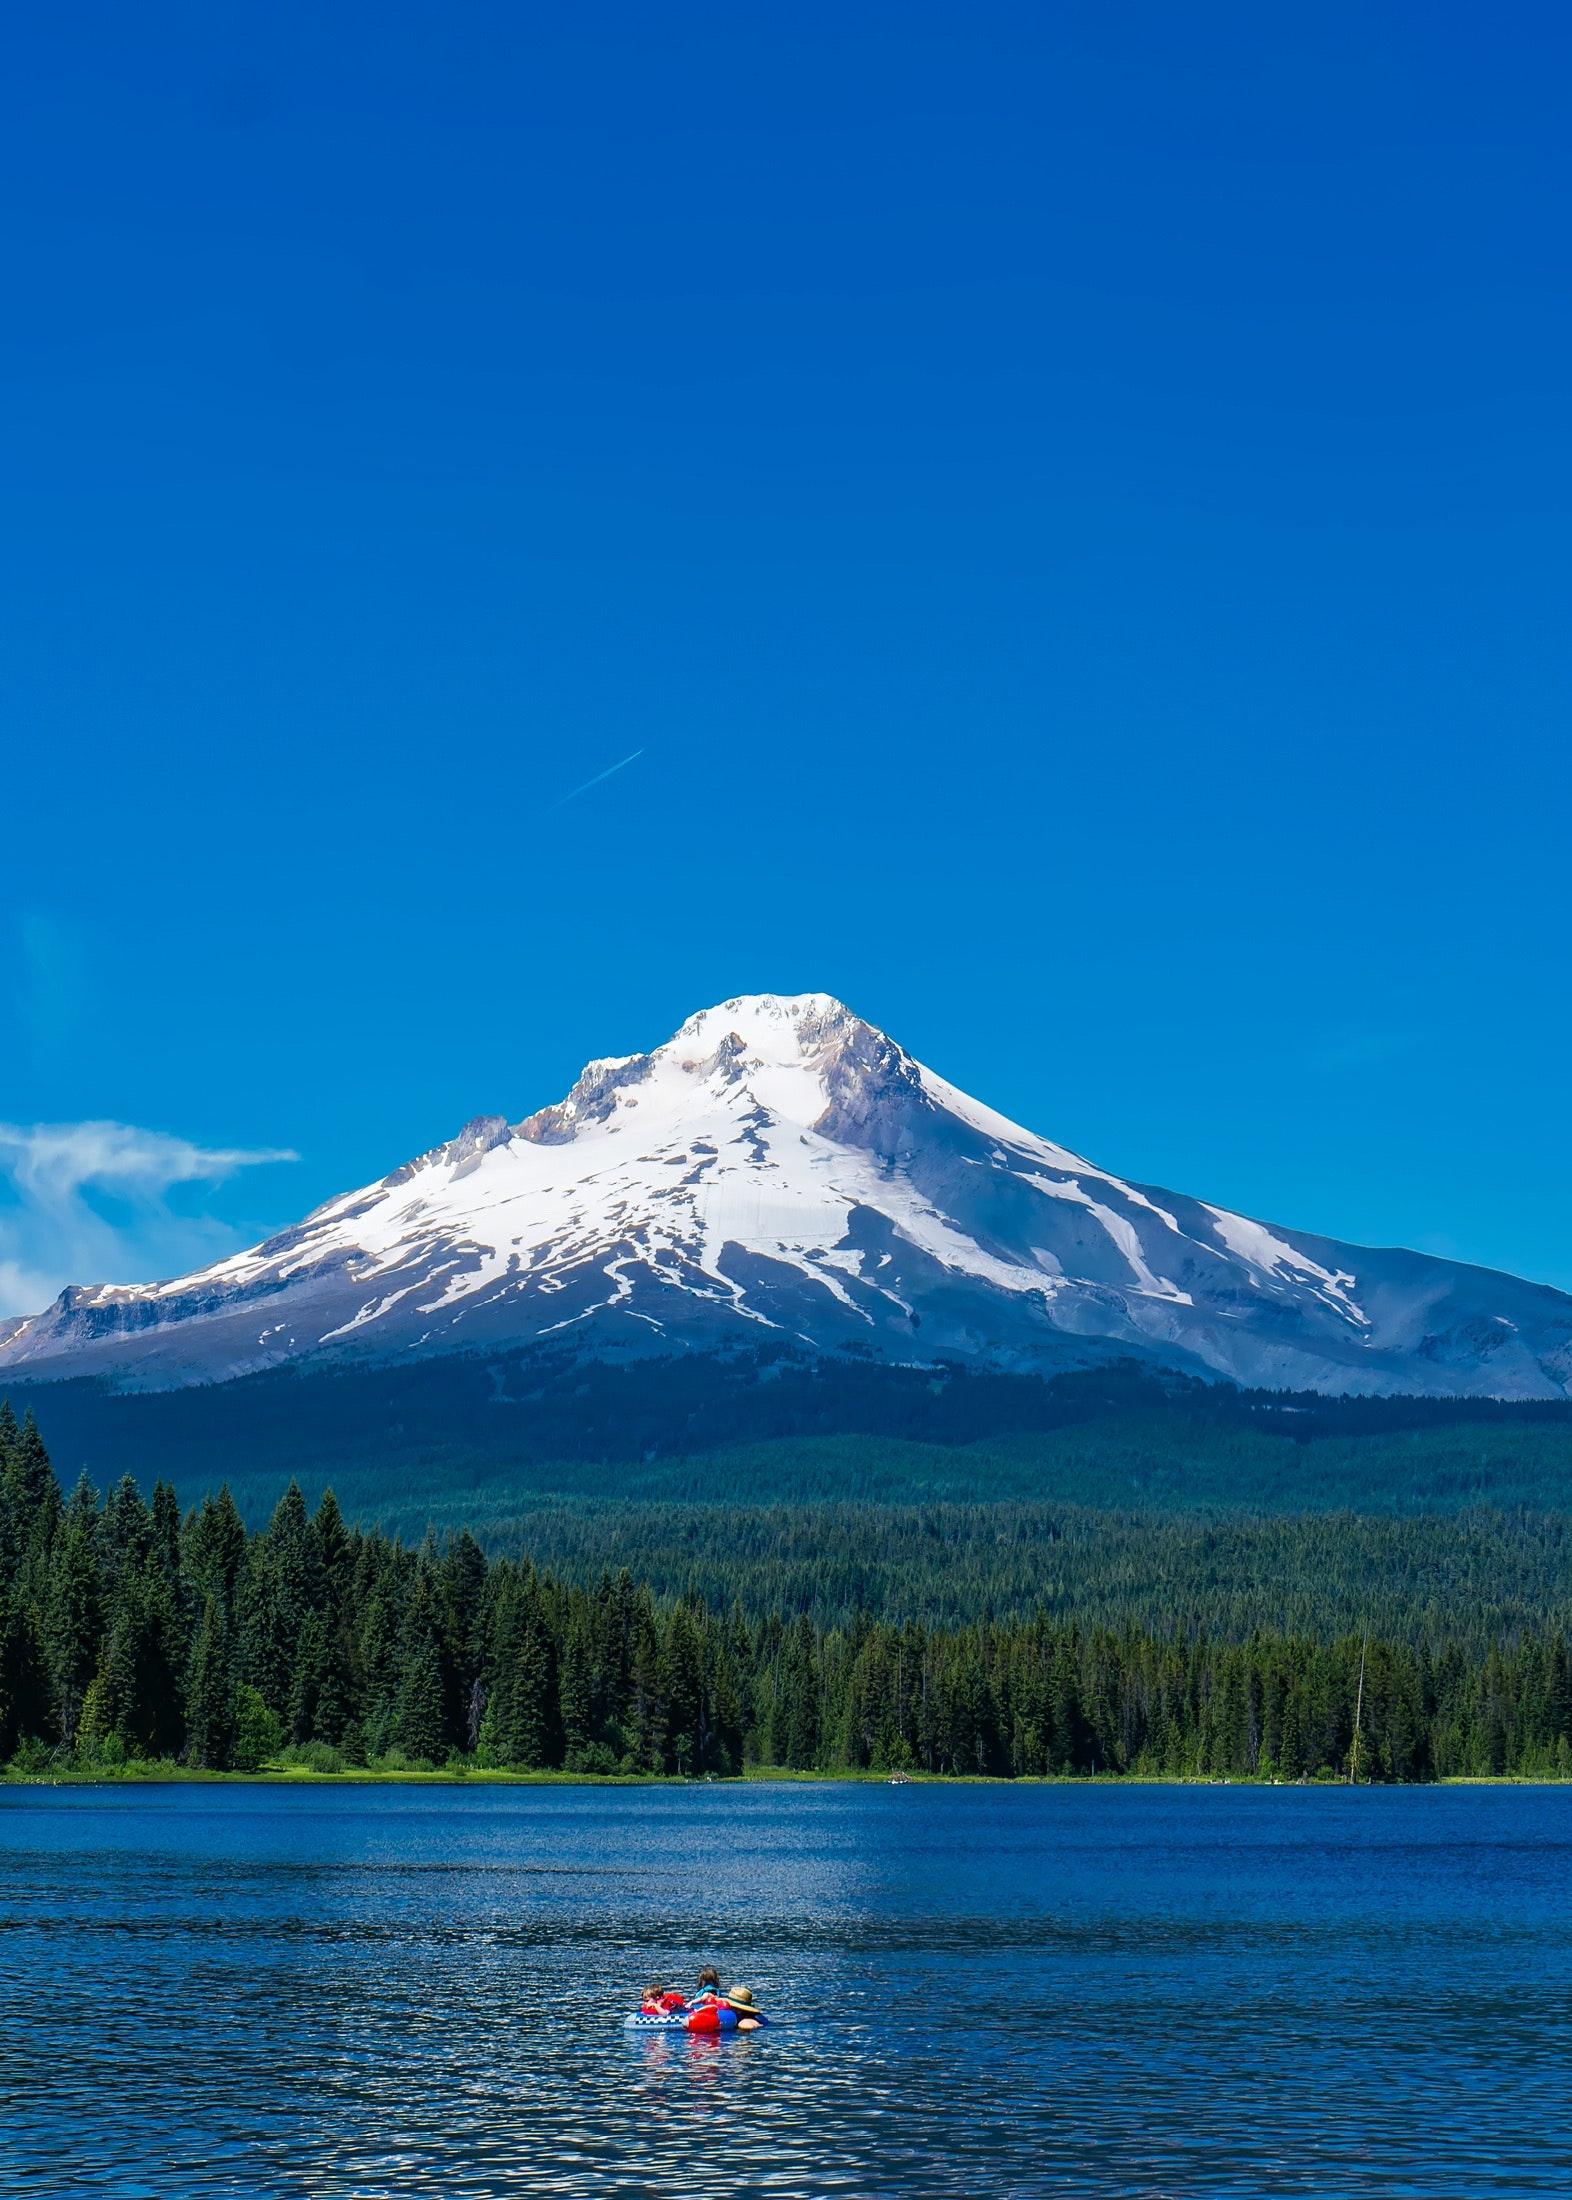 Scenic view of lake against mountain range photo